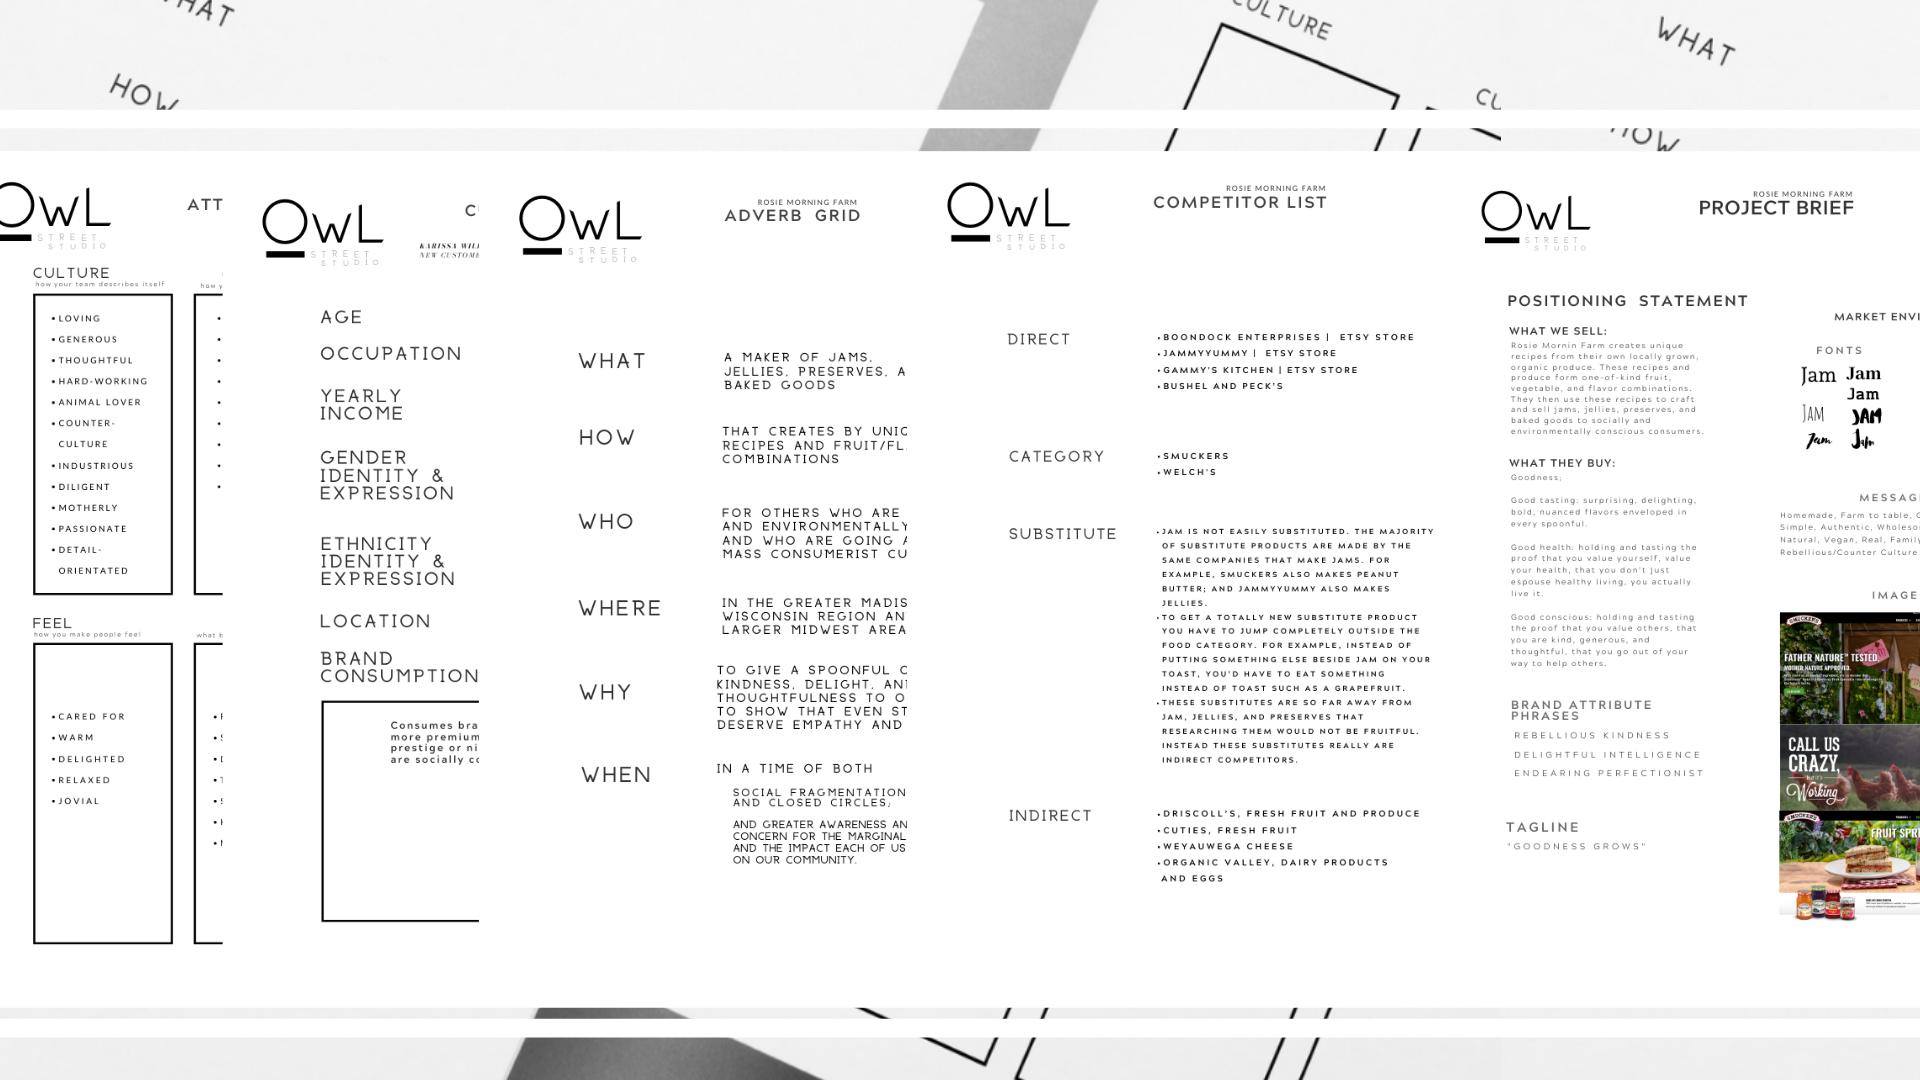 Example of branding kit created by Owl Street Studio for Rosie Morning Farm